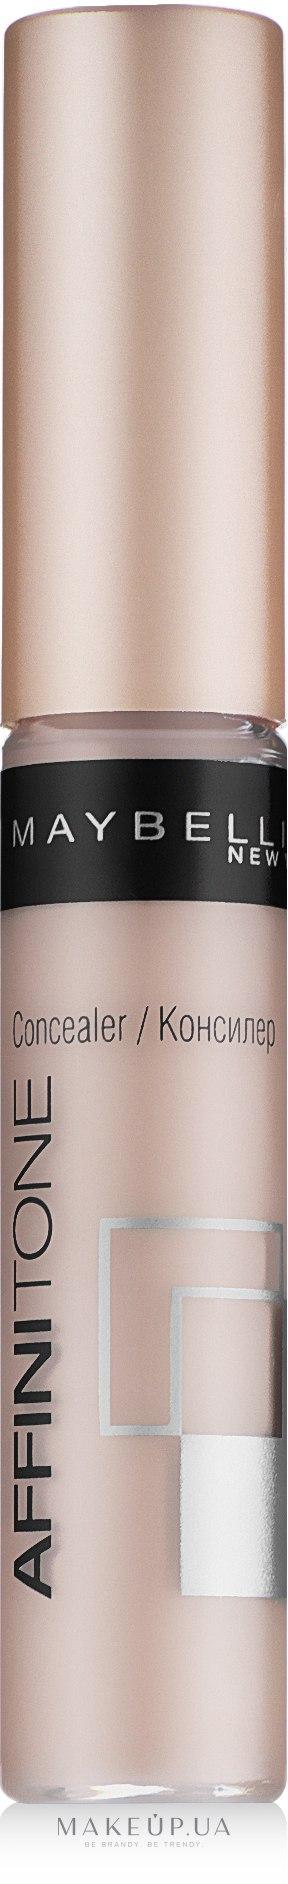 Корректор - Maybelline New York Affinitone Concealer — фото 01 - Nude